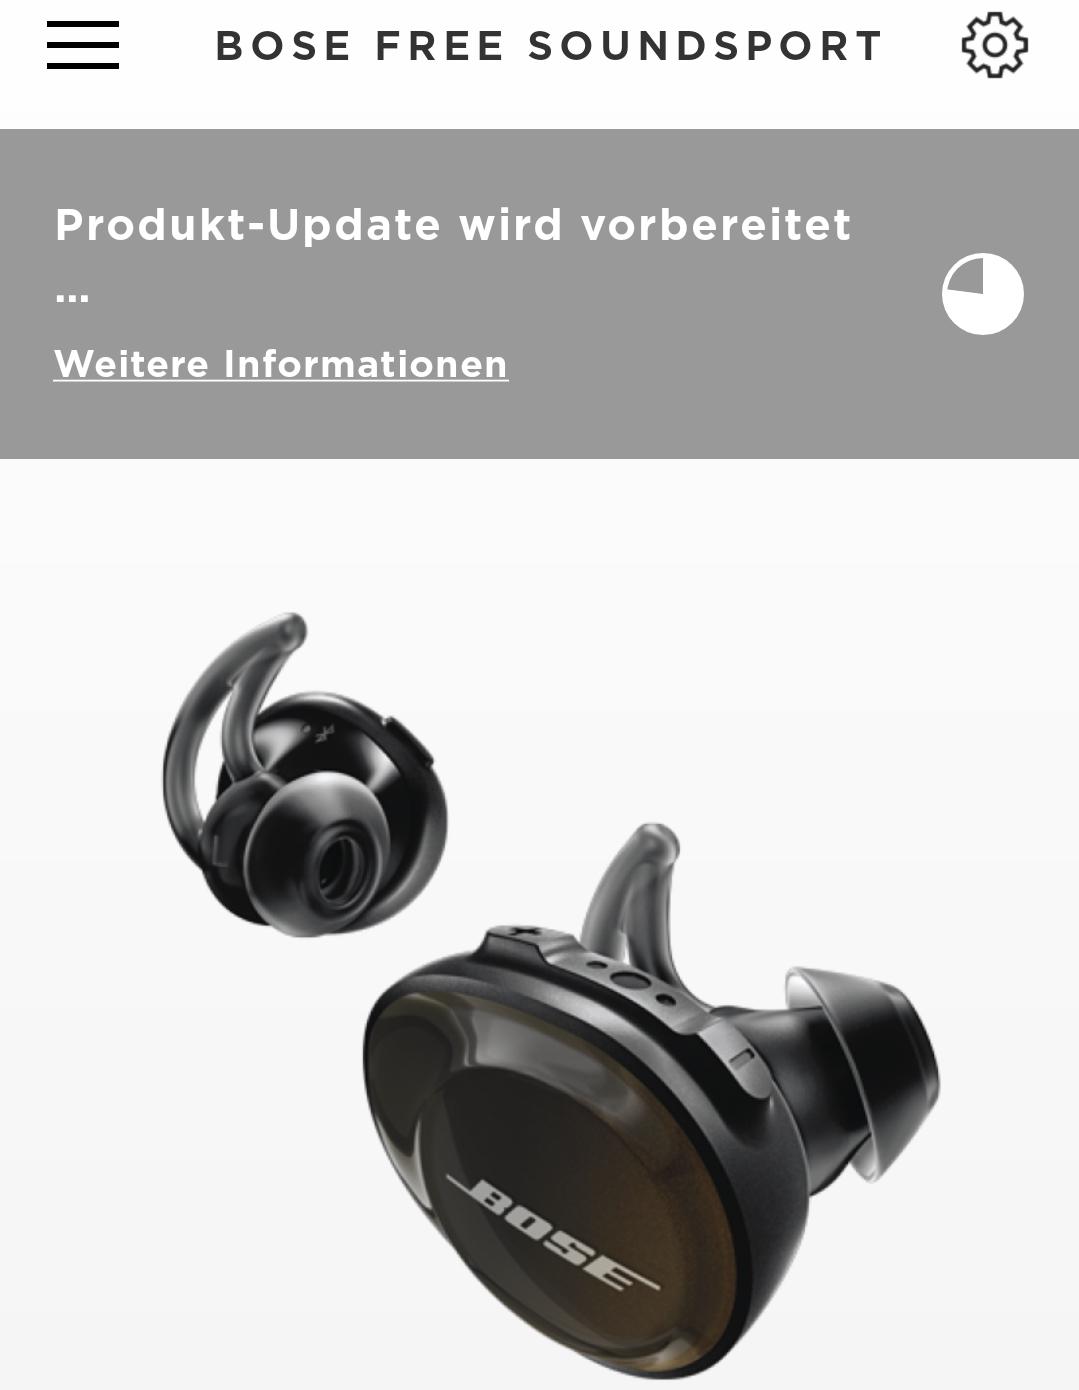 Update für die Bose SoundSport Free (Foto: SmartPhoneFan.de)